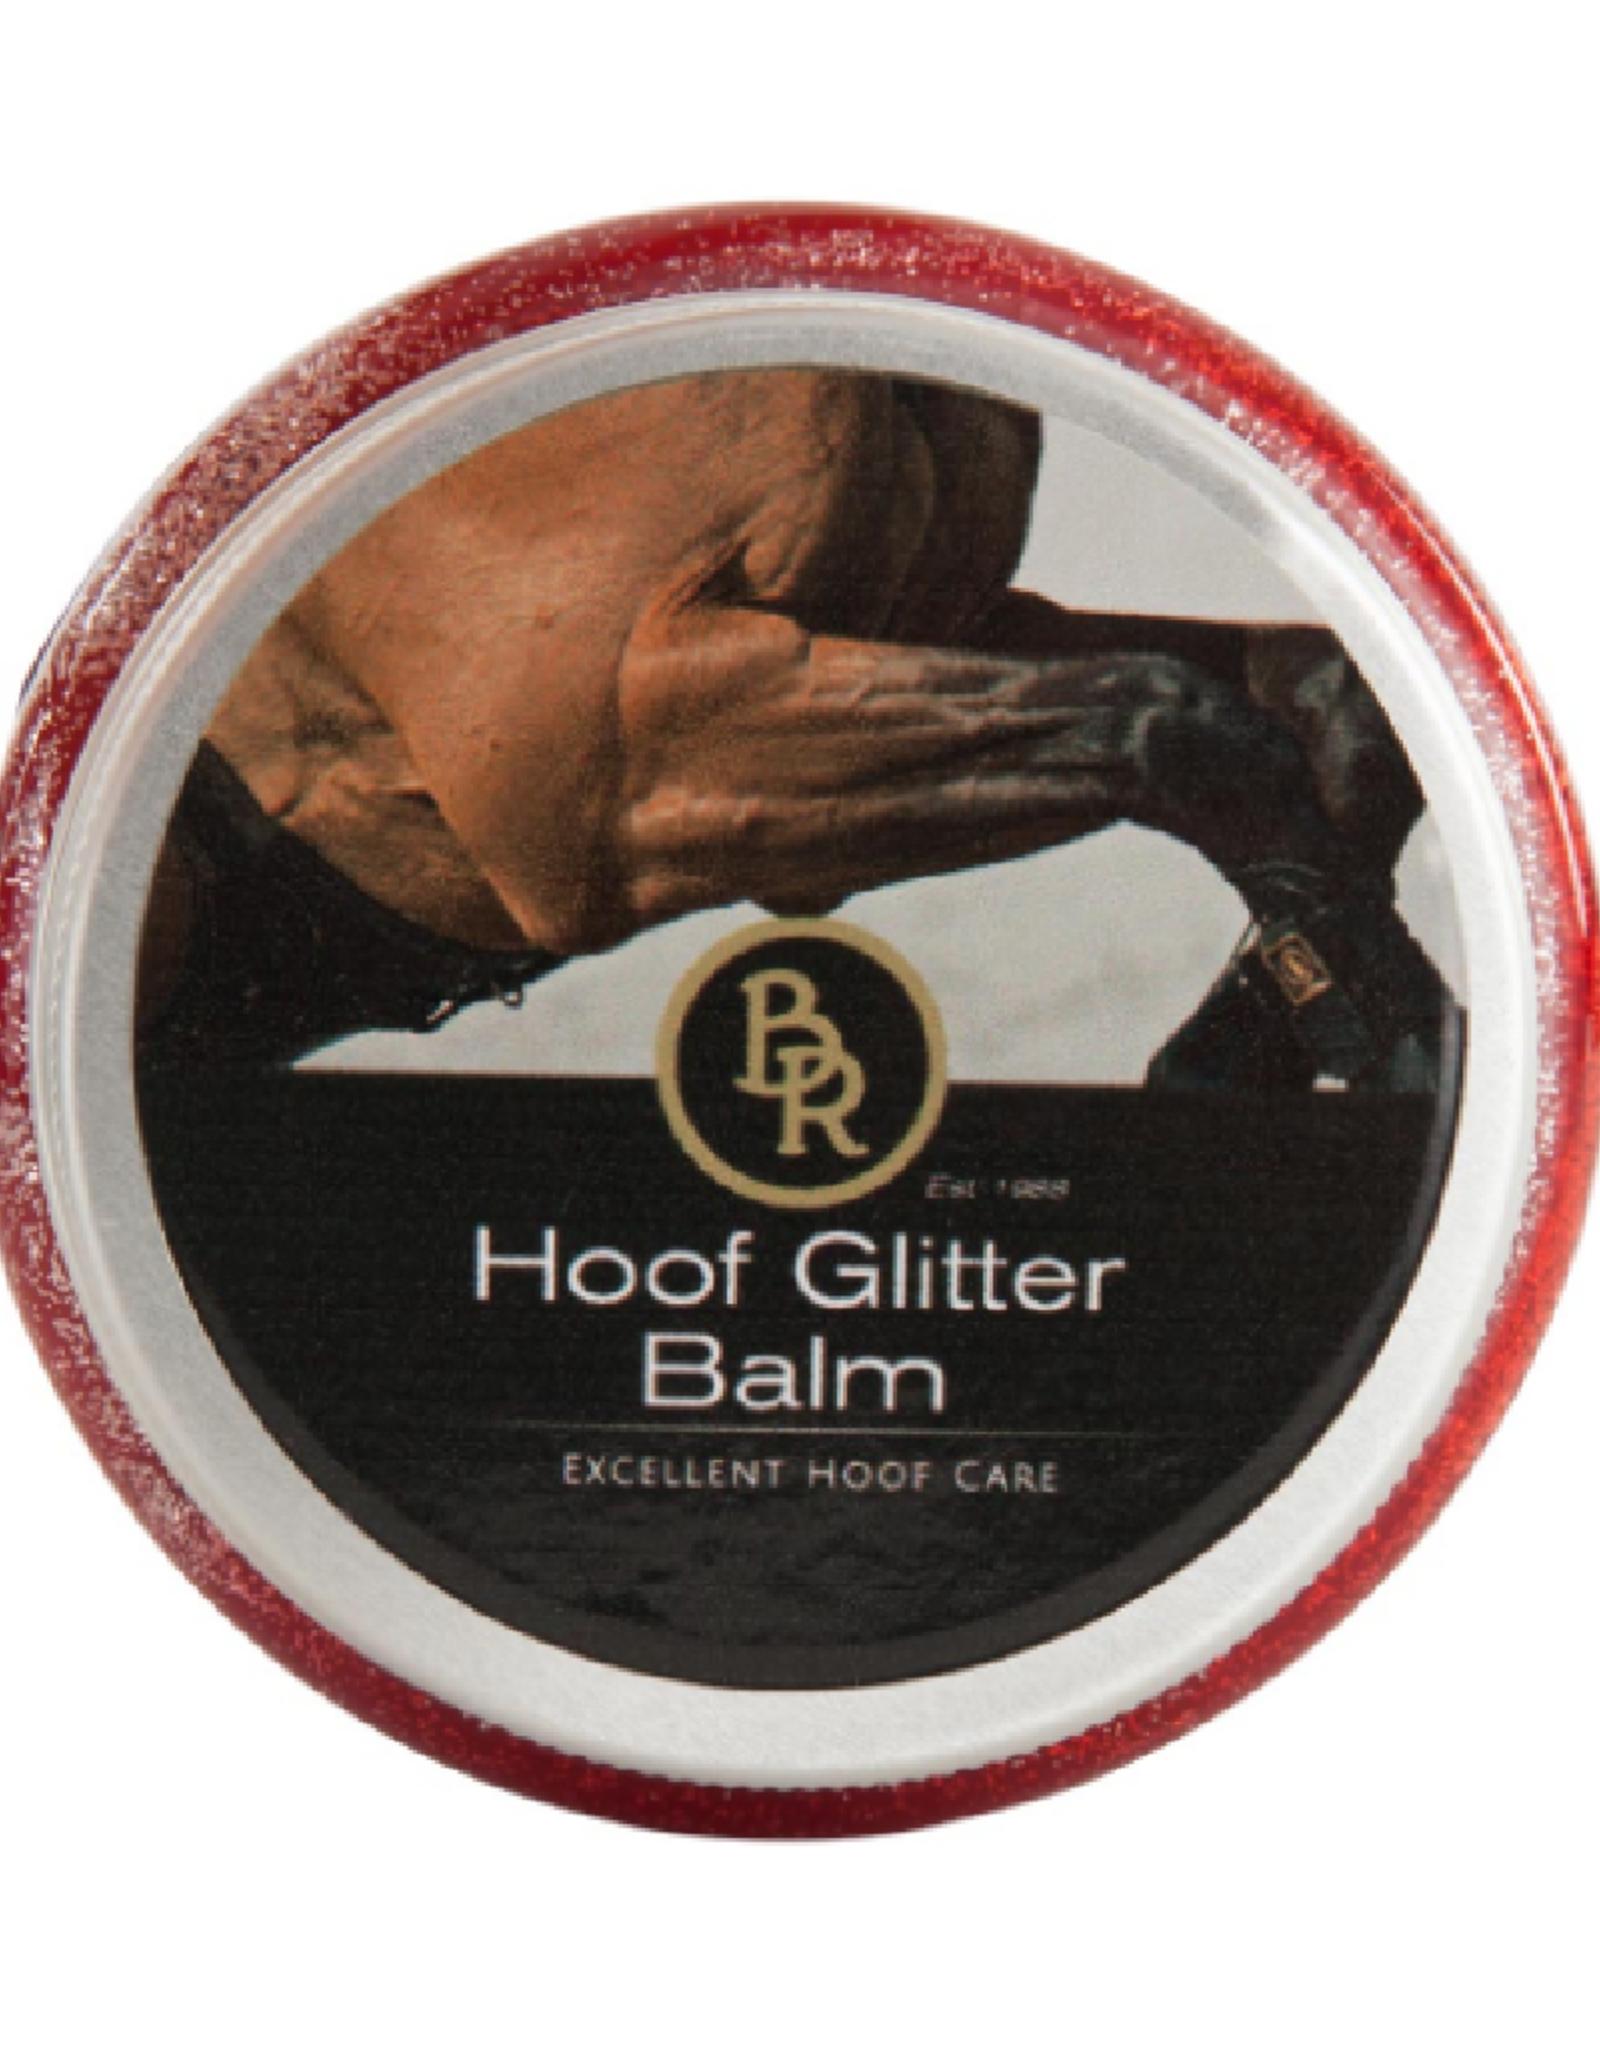 BR BR Hoef Glitter Balm 250ml